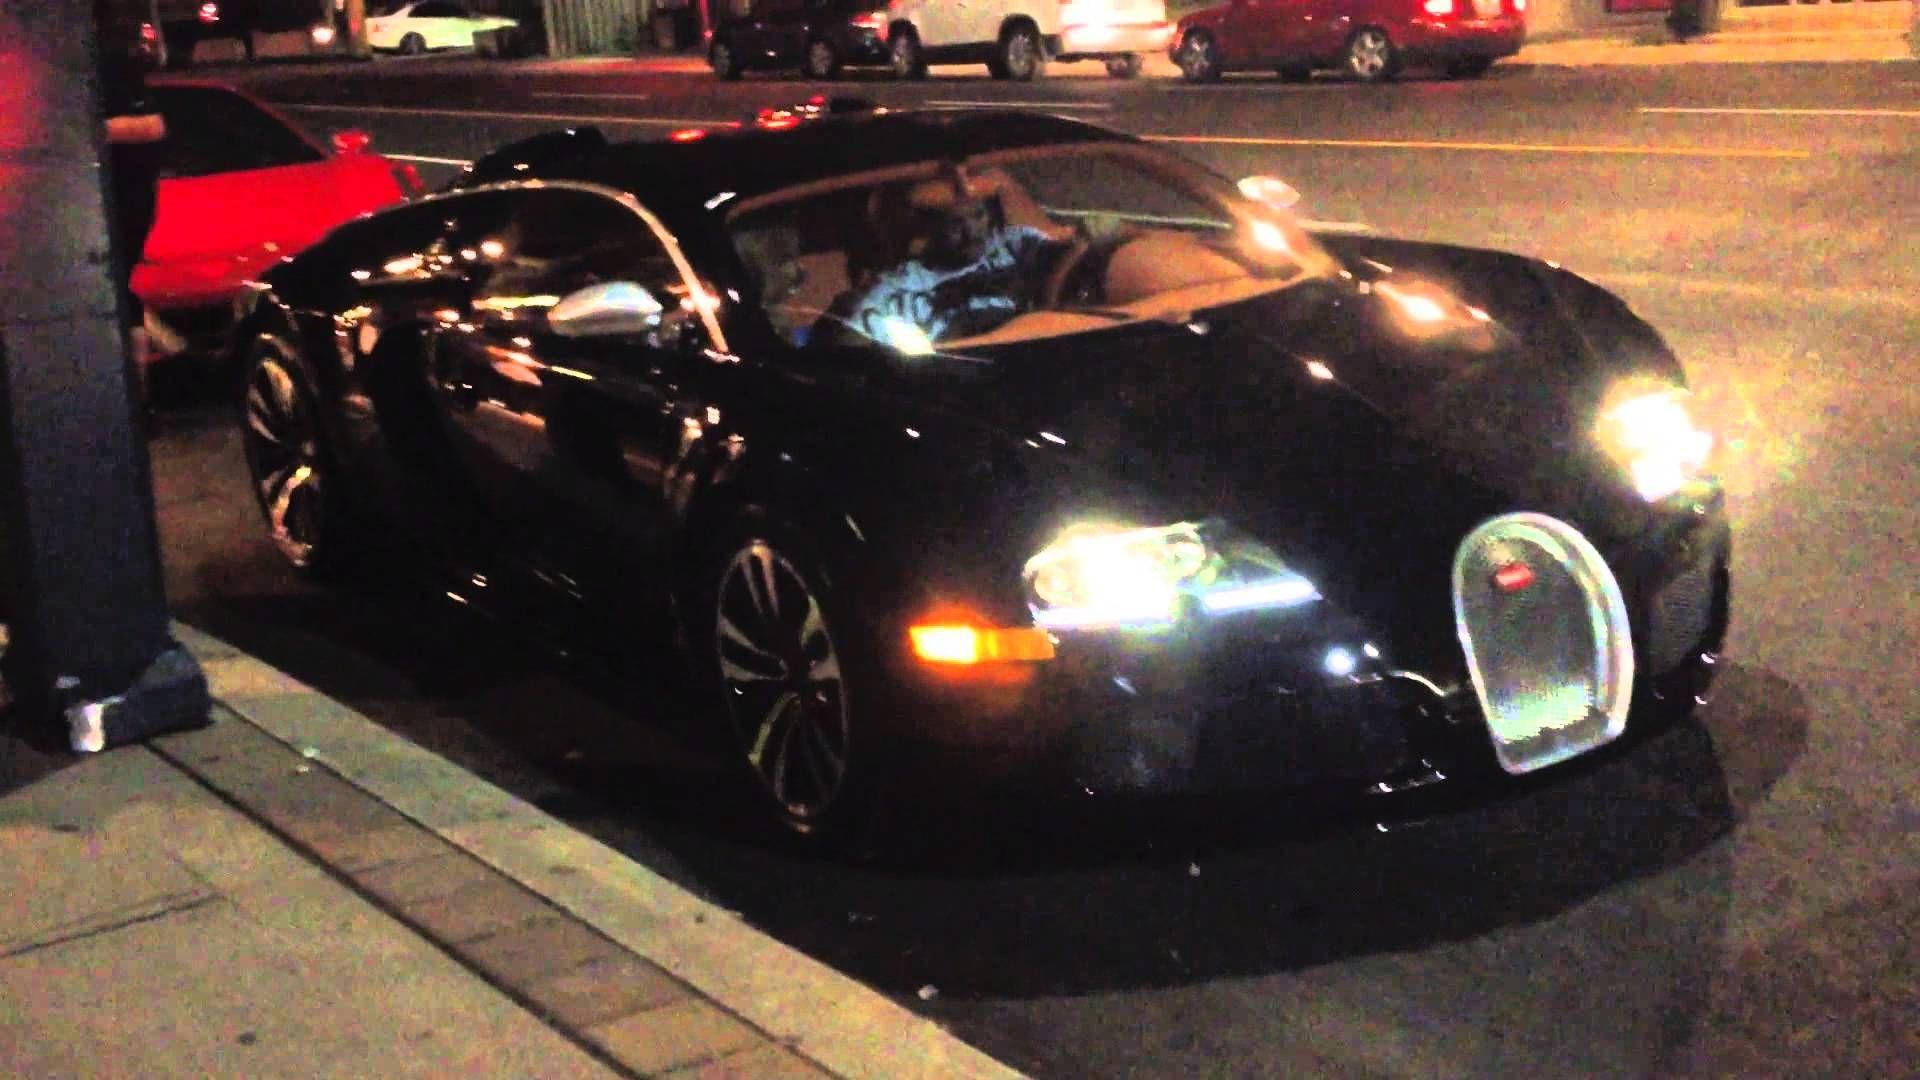 Drake can't get his car (Bugatti) to start with nicki